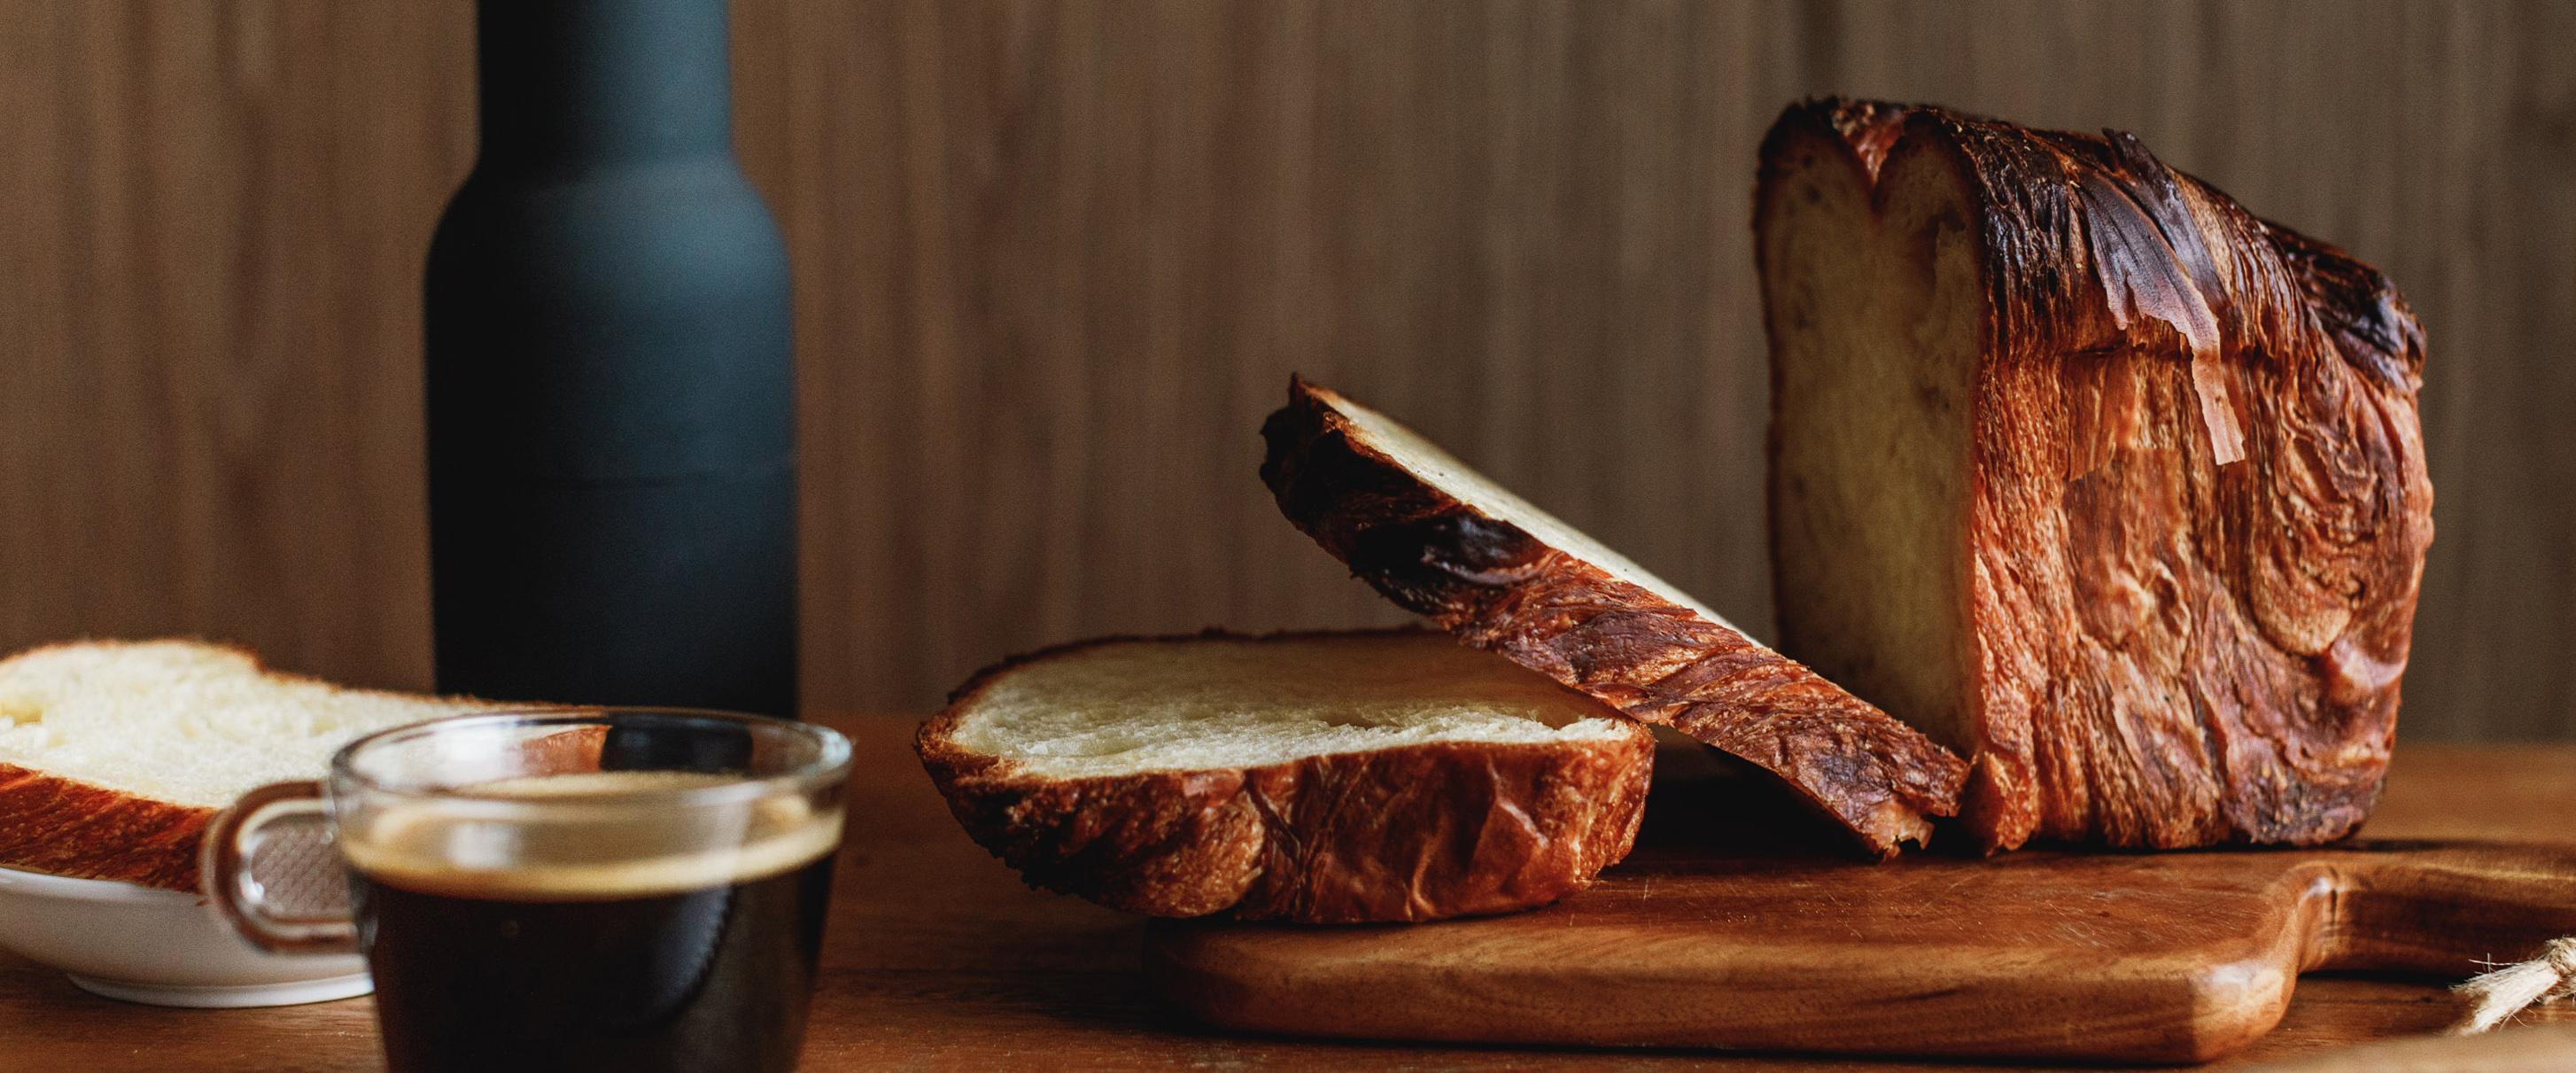 brioche-bread-lifestyle-banner-015